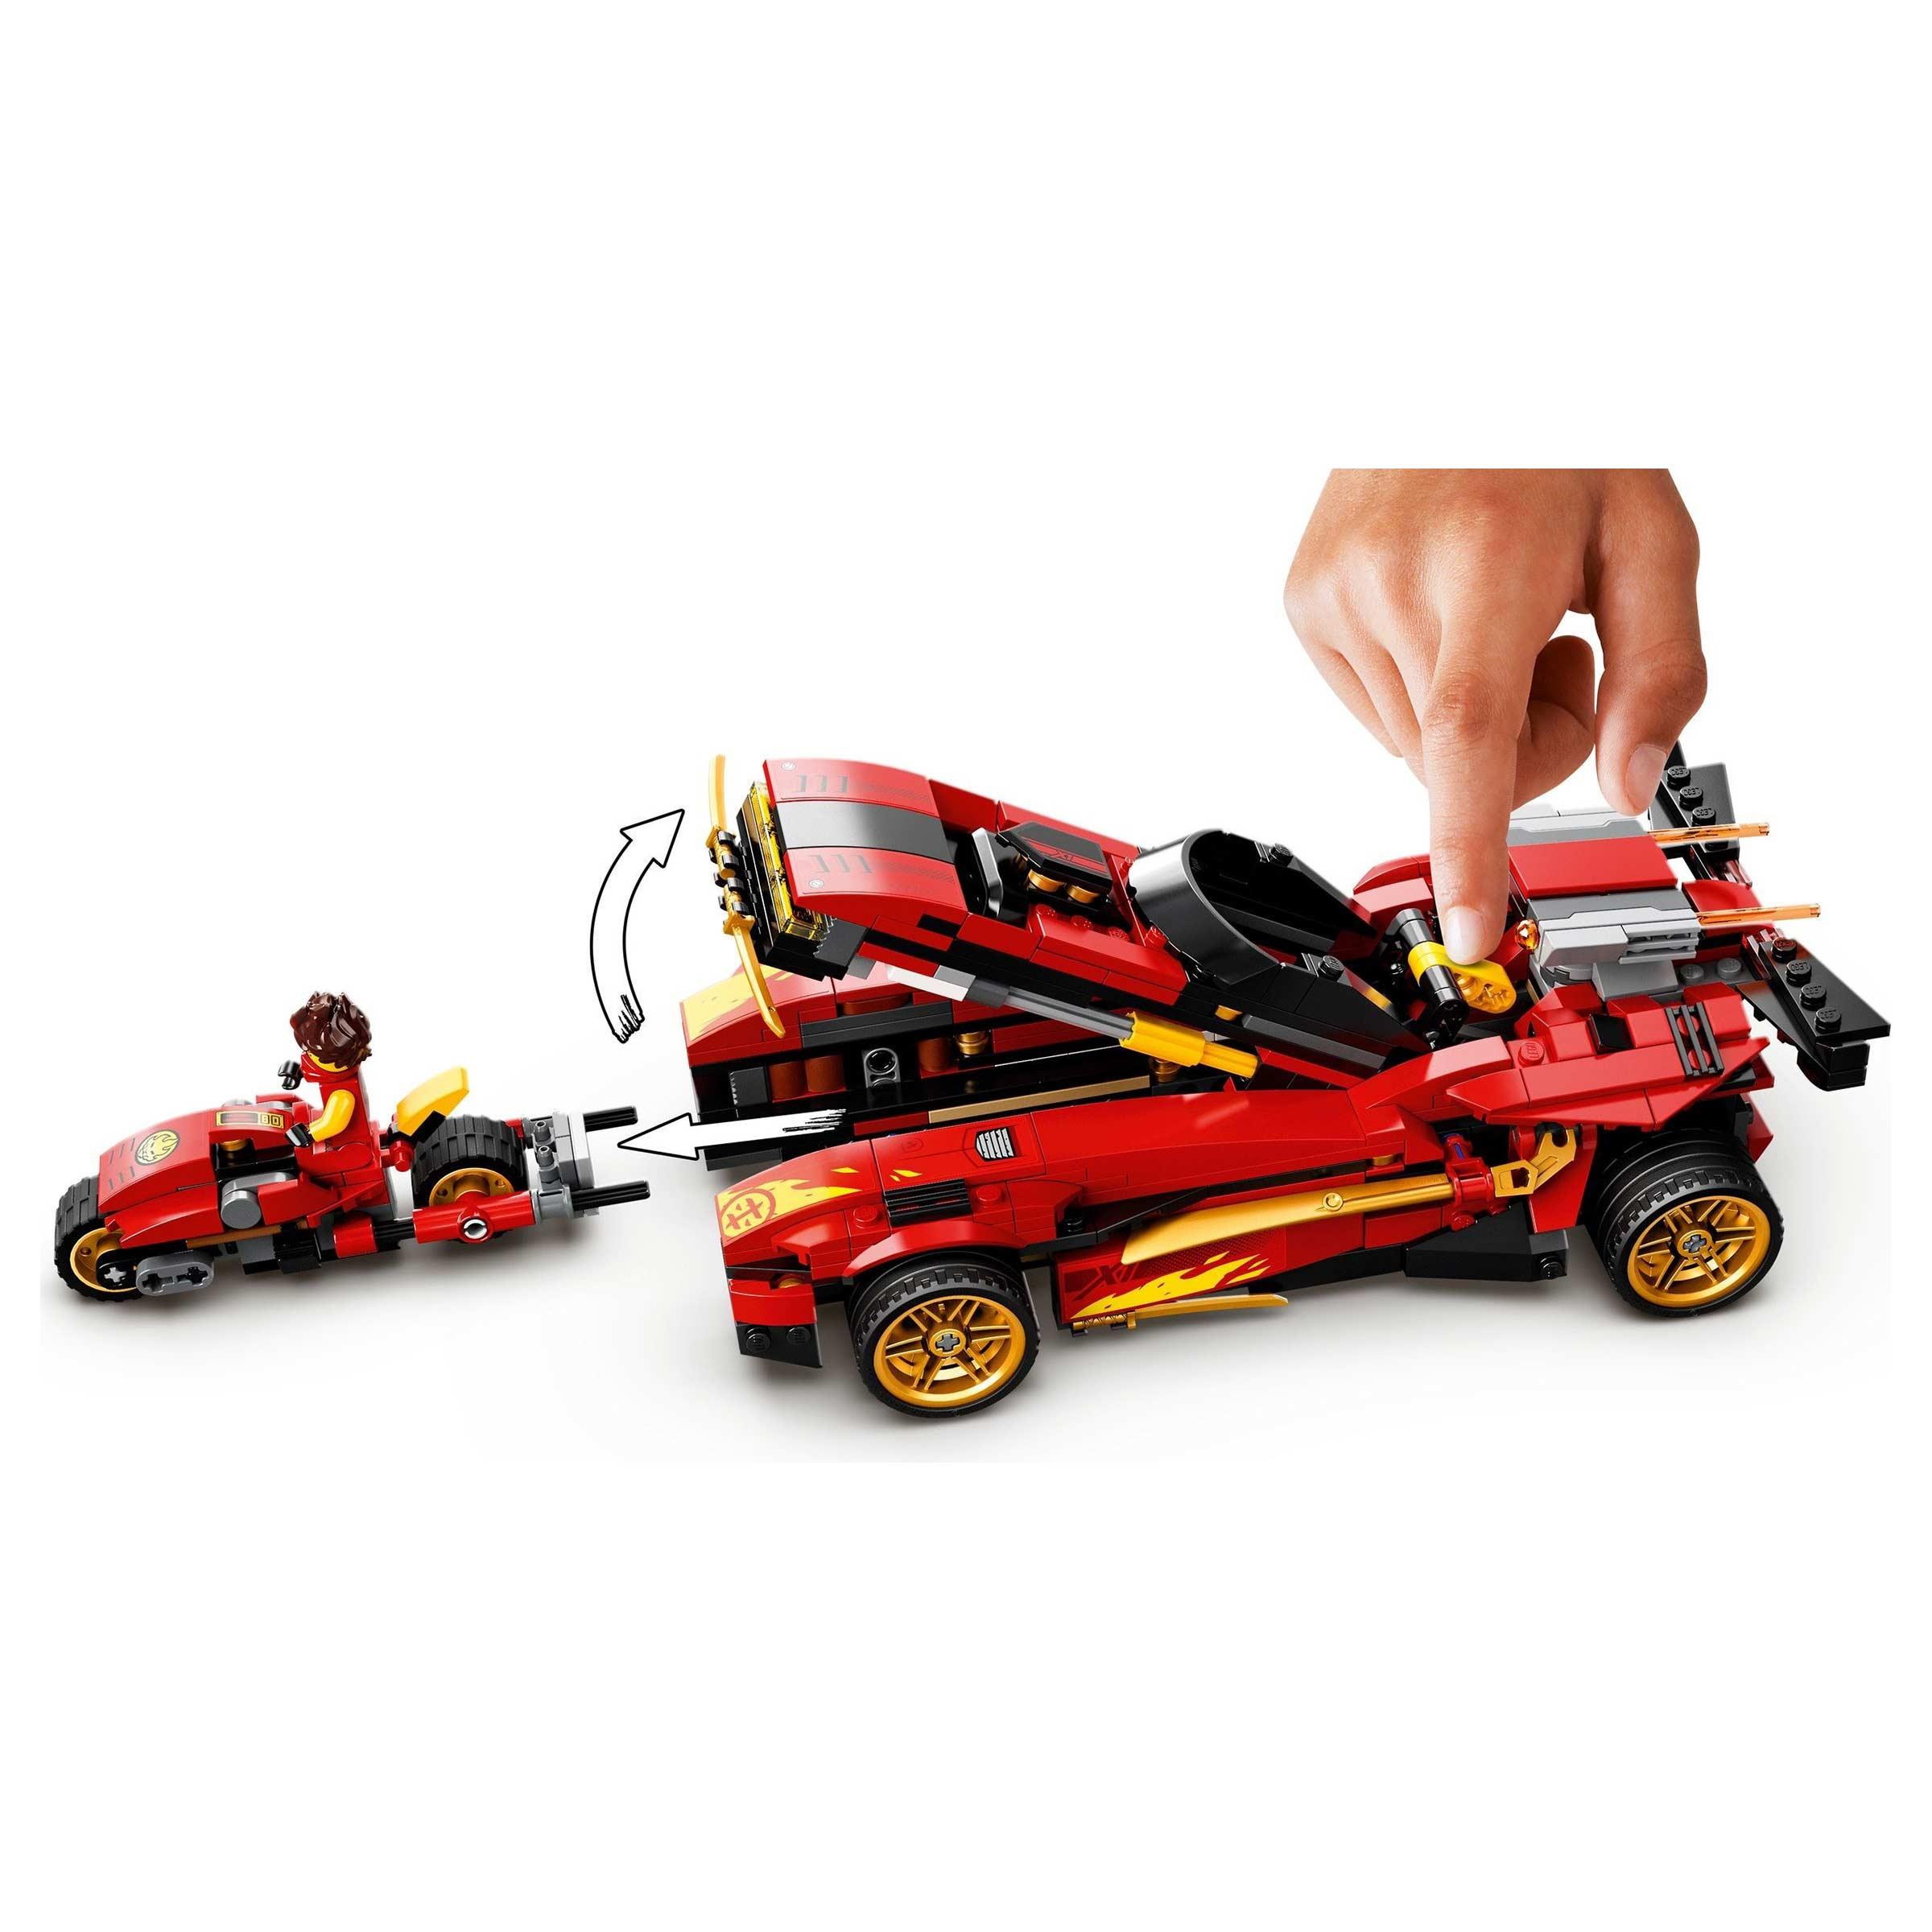 LEGO 71737 Ninjago X-1 Ninja Charger at Toys R Us